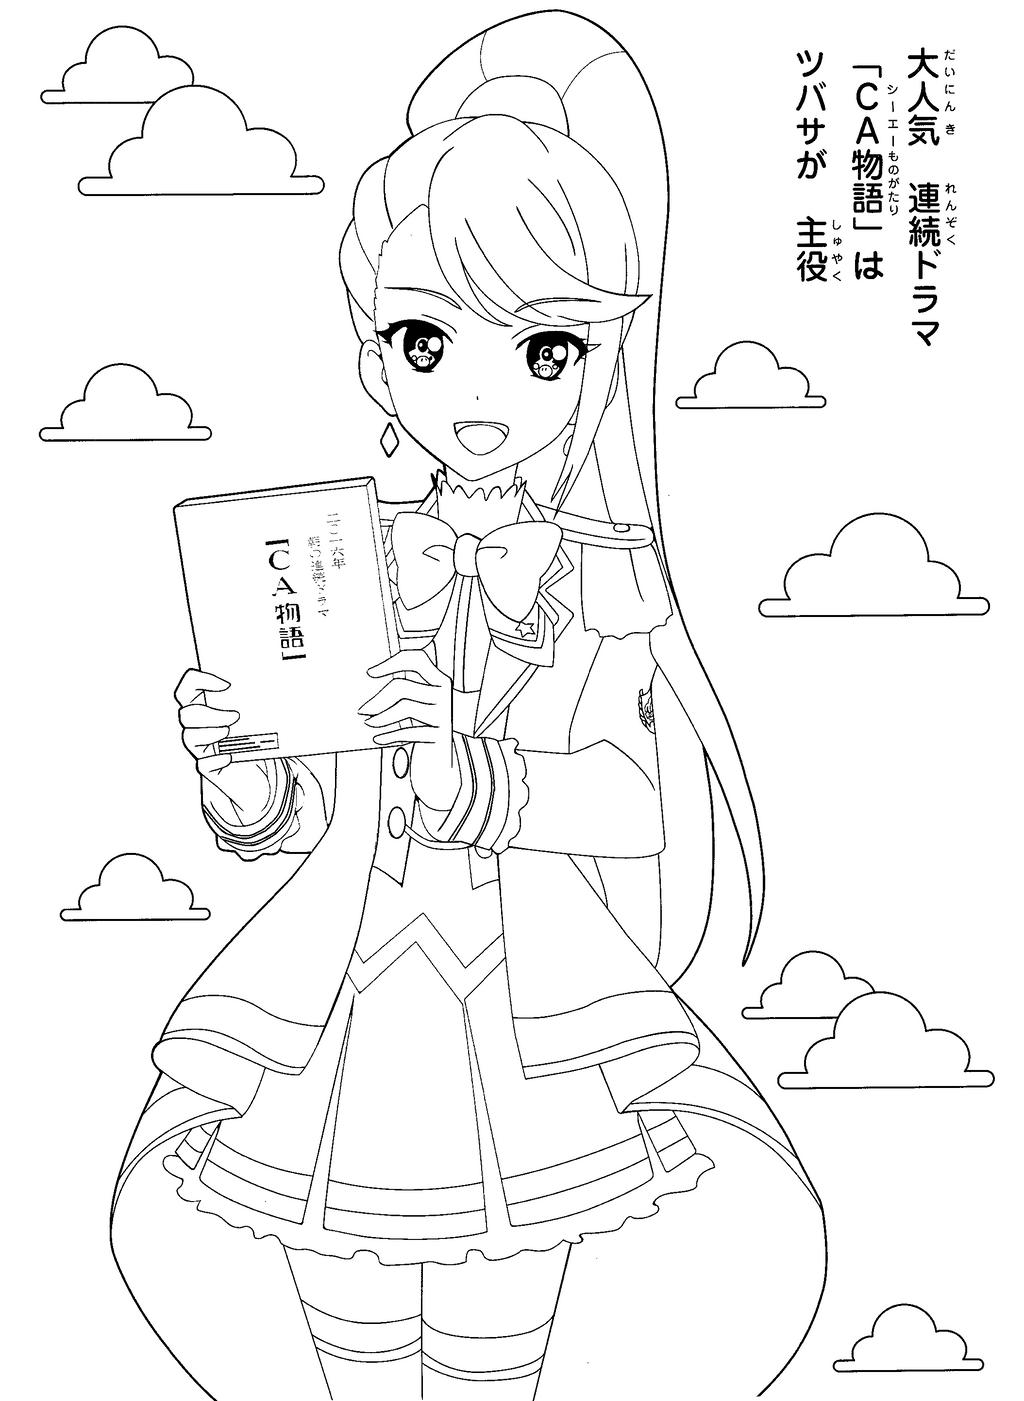 Aikatsu Coloring Pages Coloring